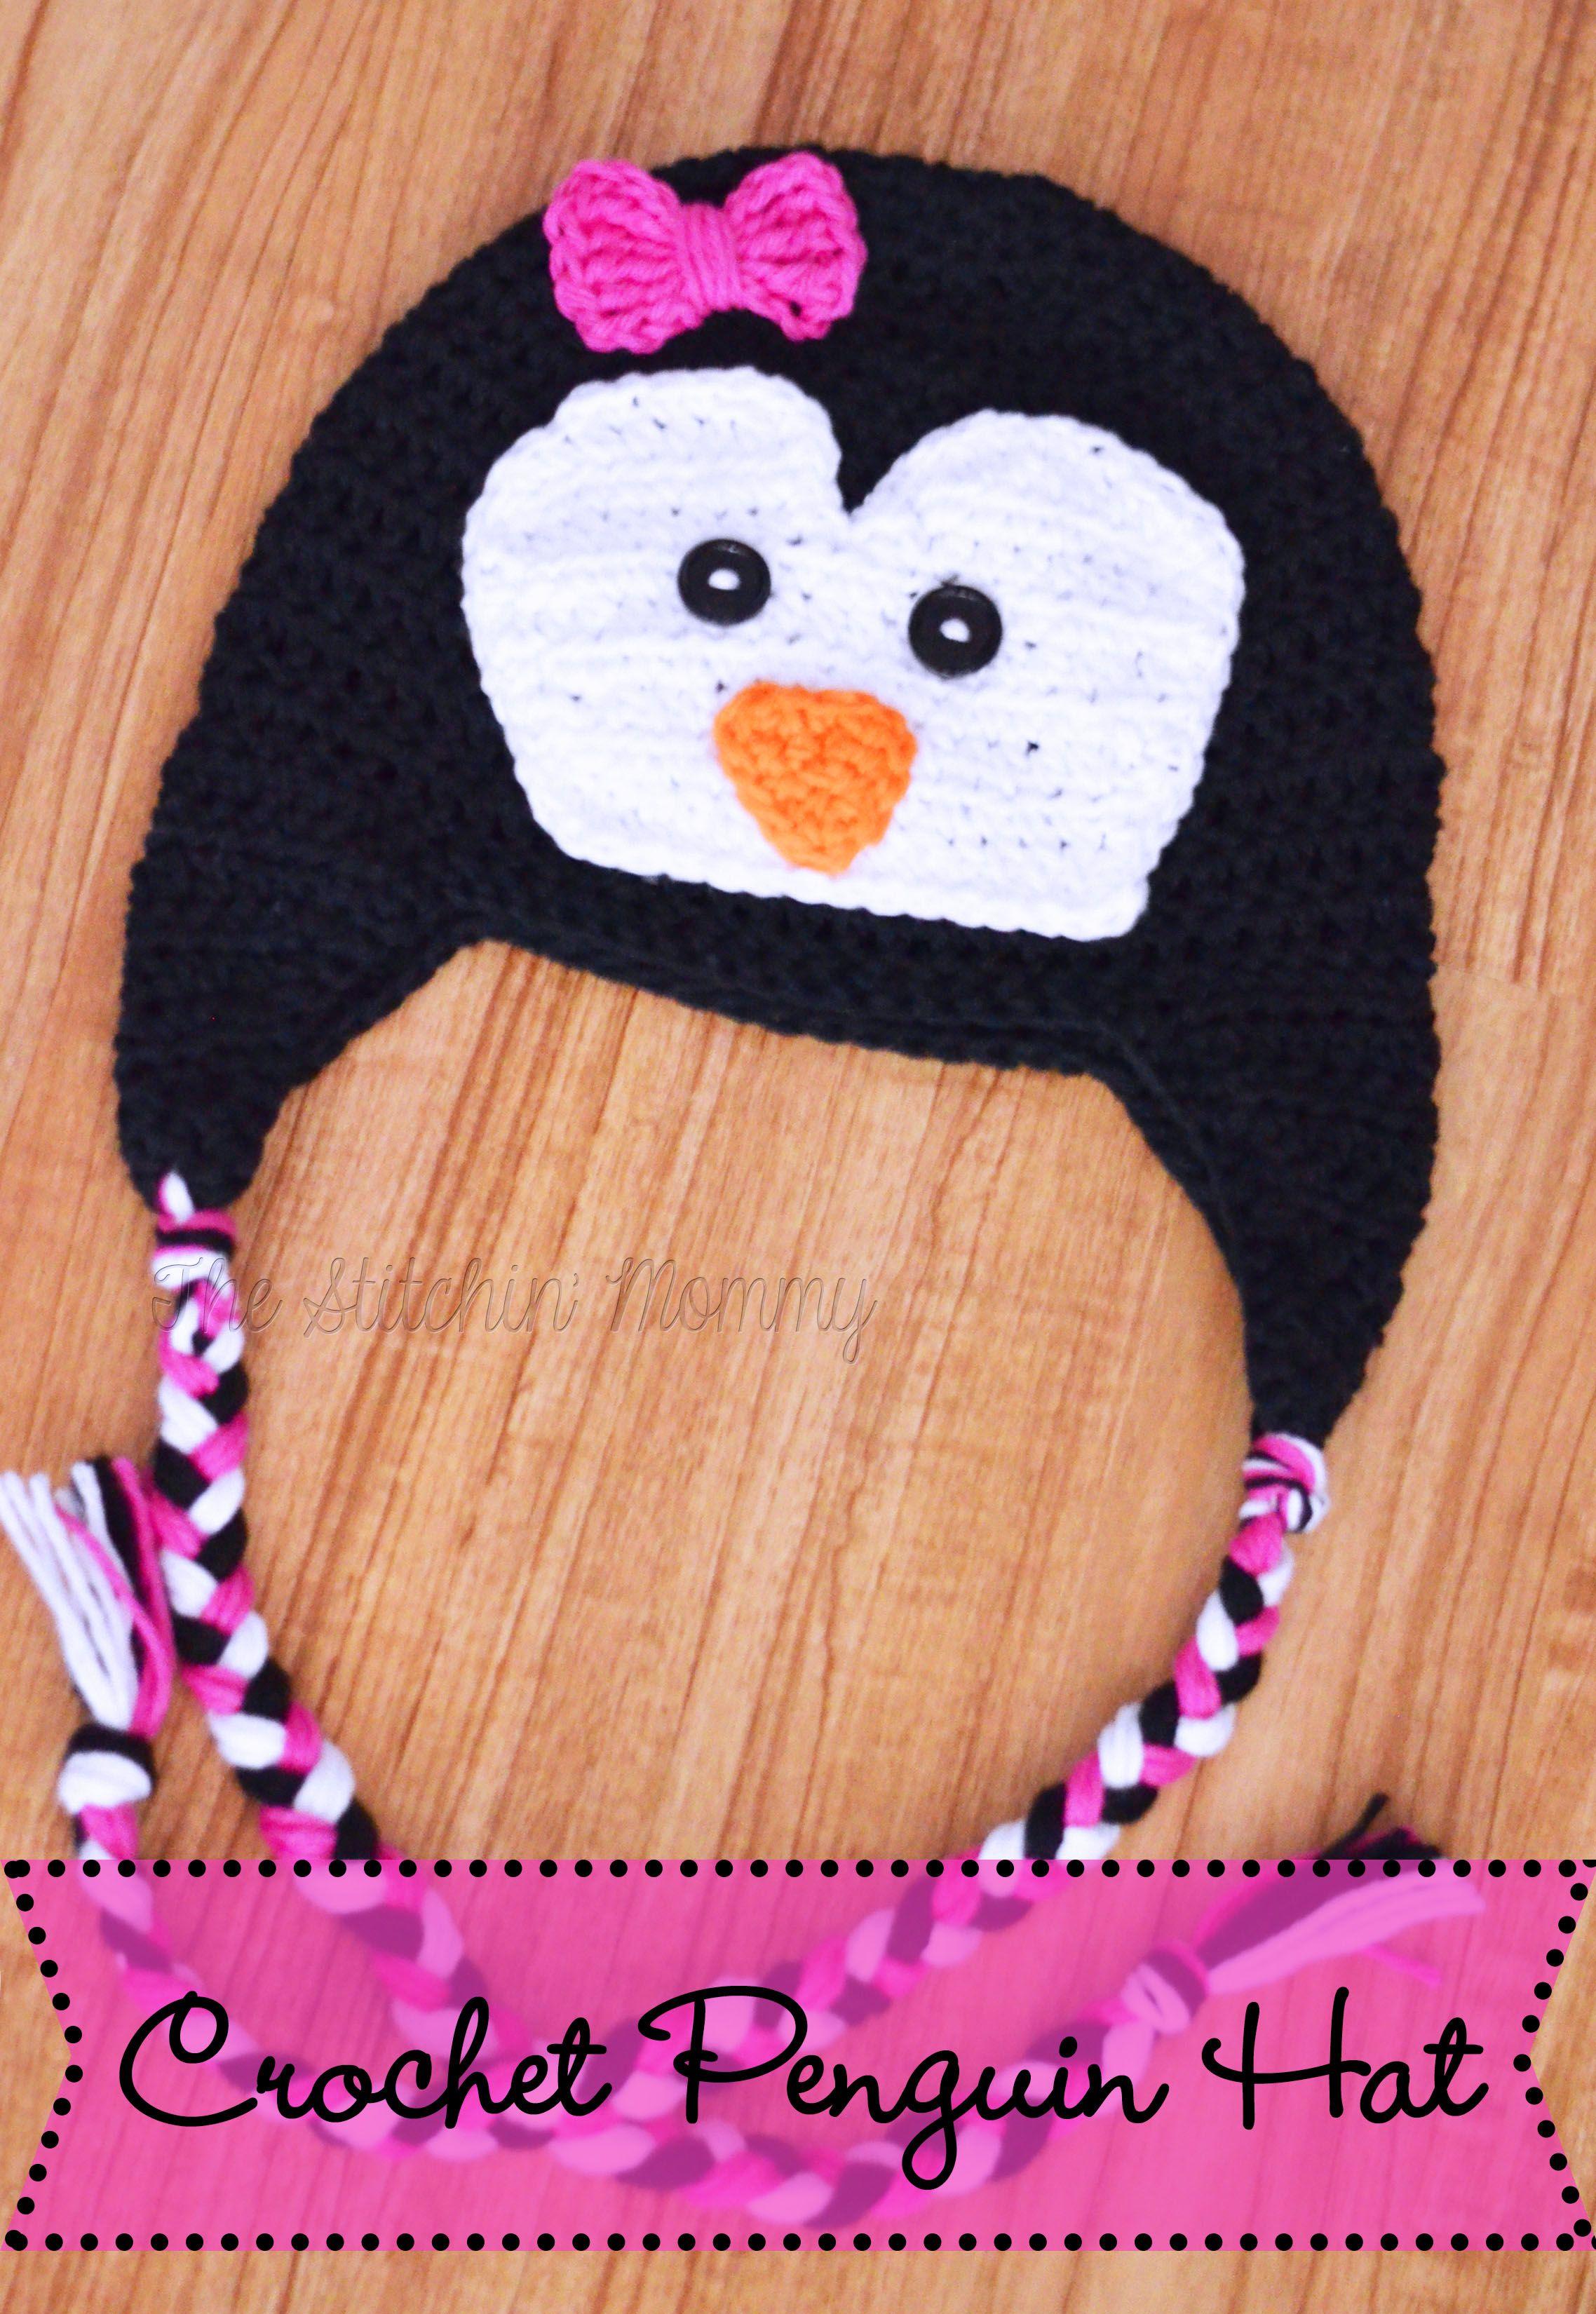 Crochet Penguin Hat Pattern - Newborn Size | The Stitchin\' Mommy ...